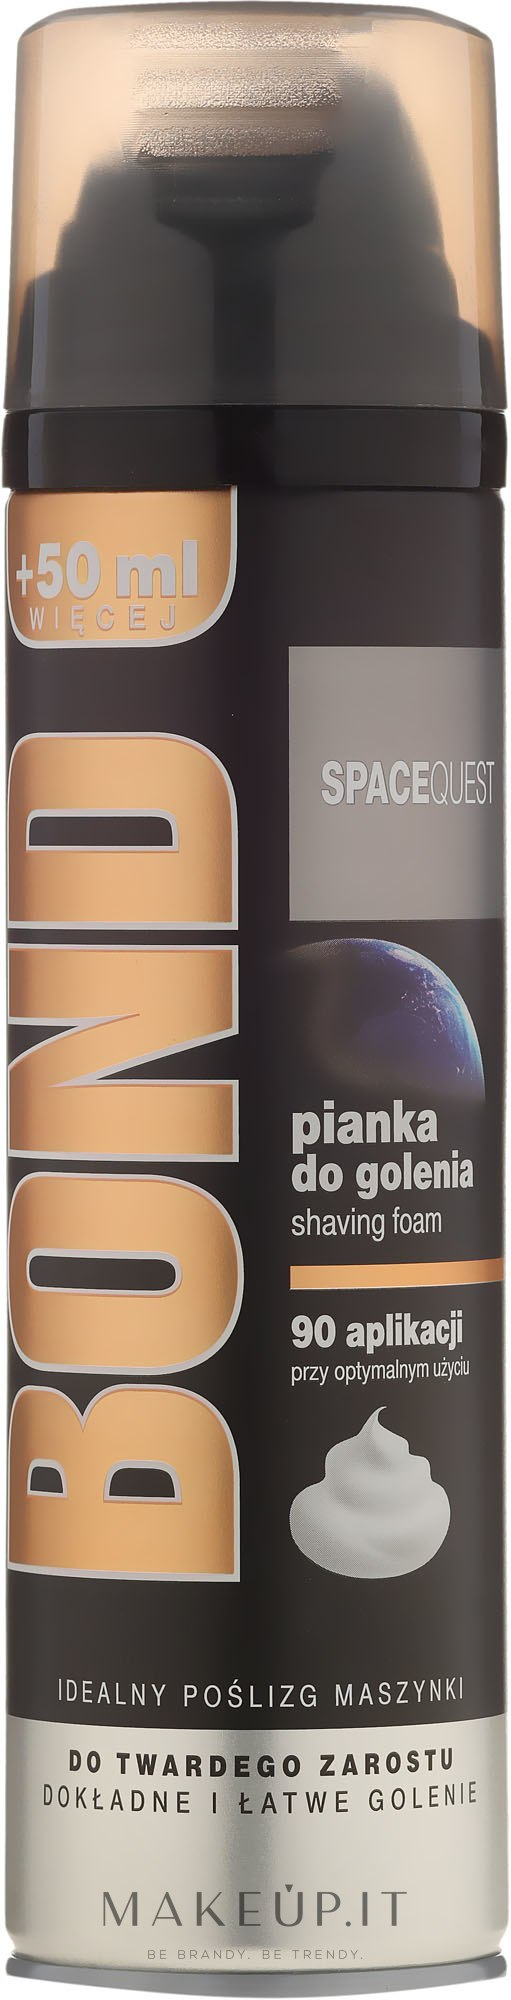 Schiuma da barba - Bond Spacequest Shaving Foam — foto 200 ml